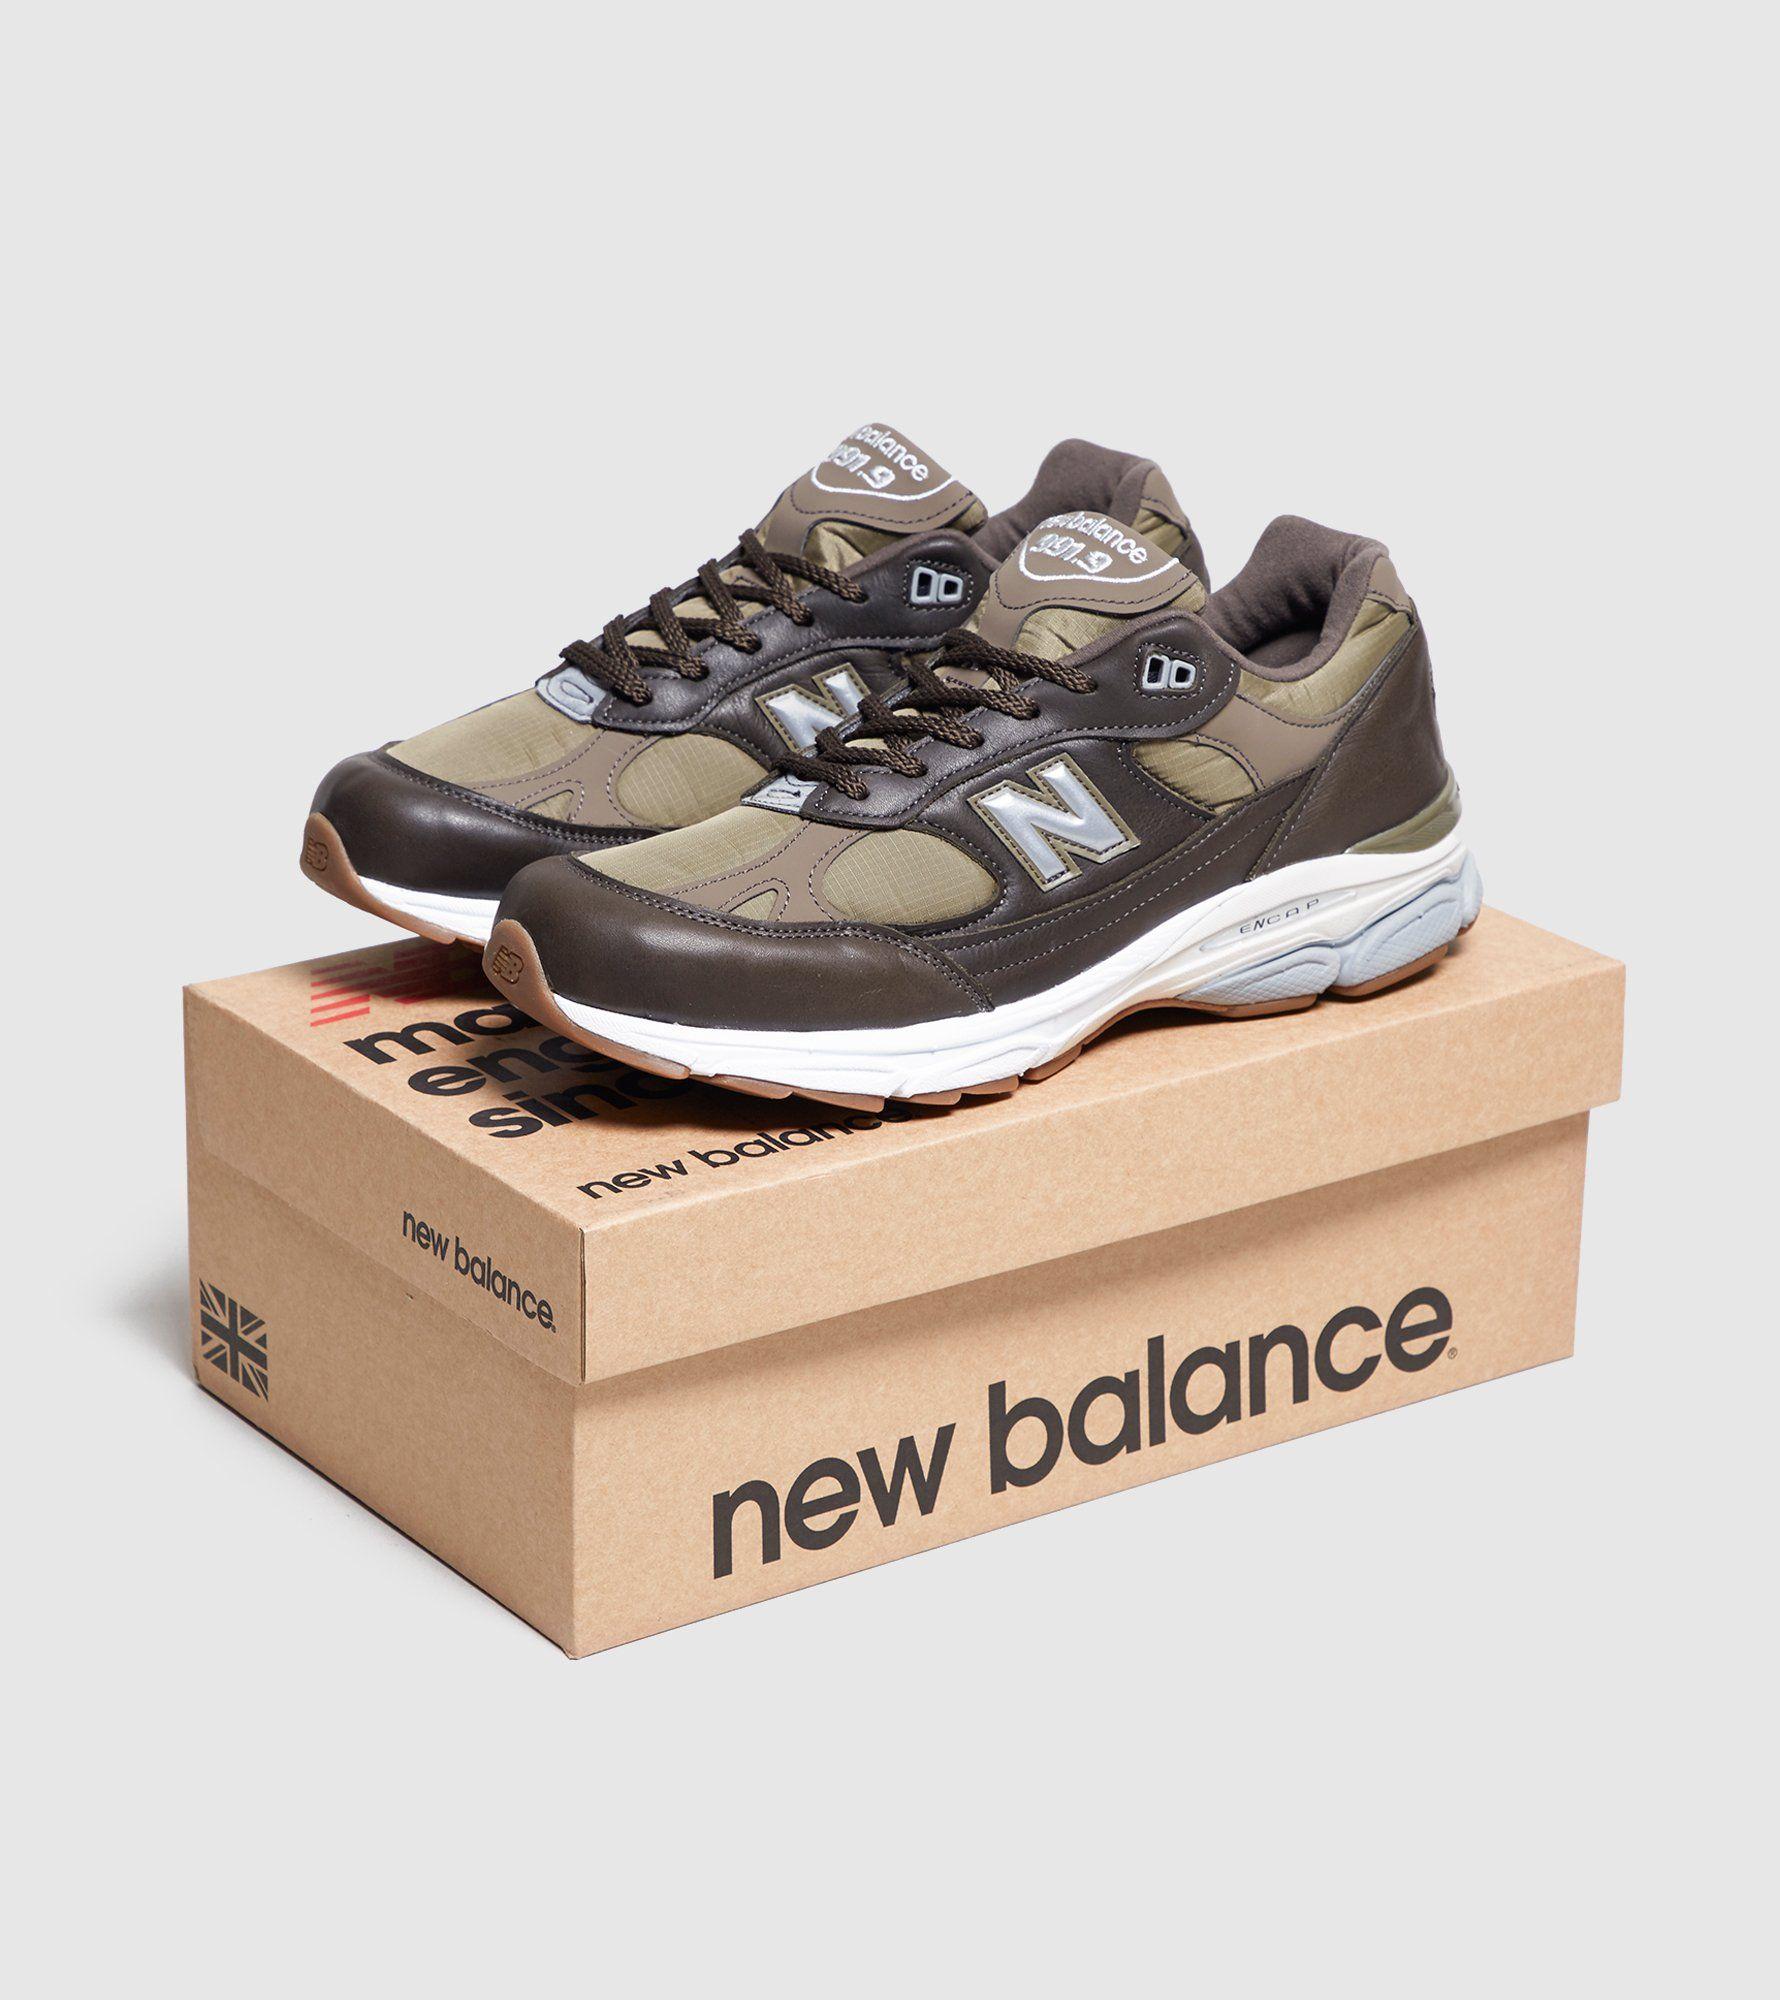 New Balance M9919